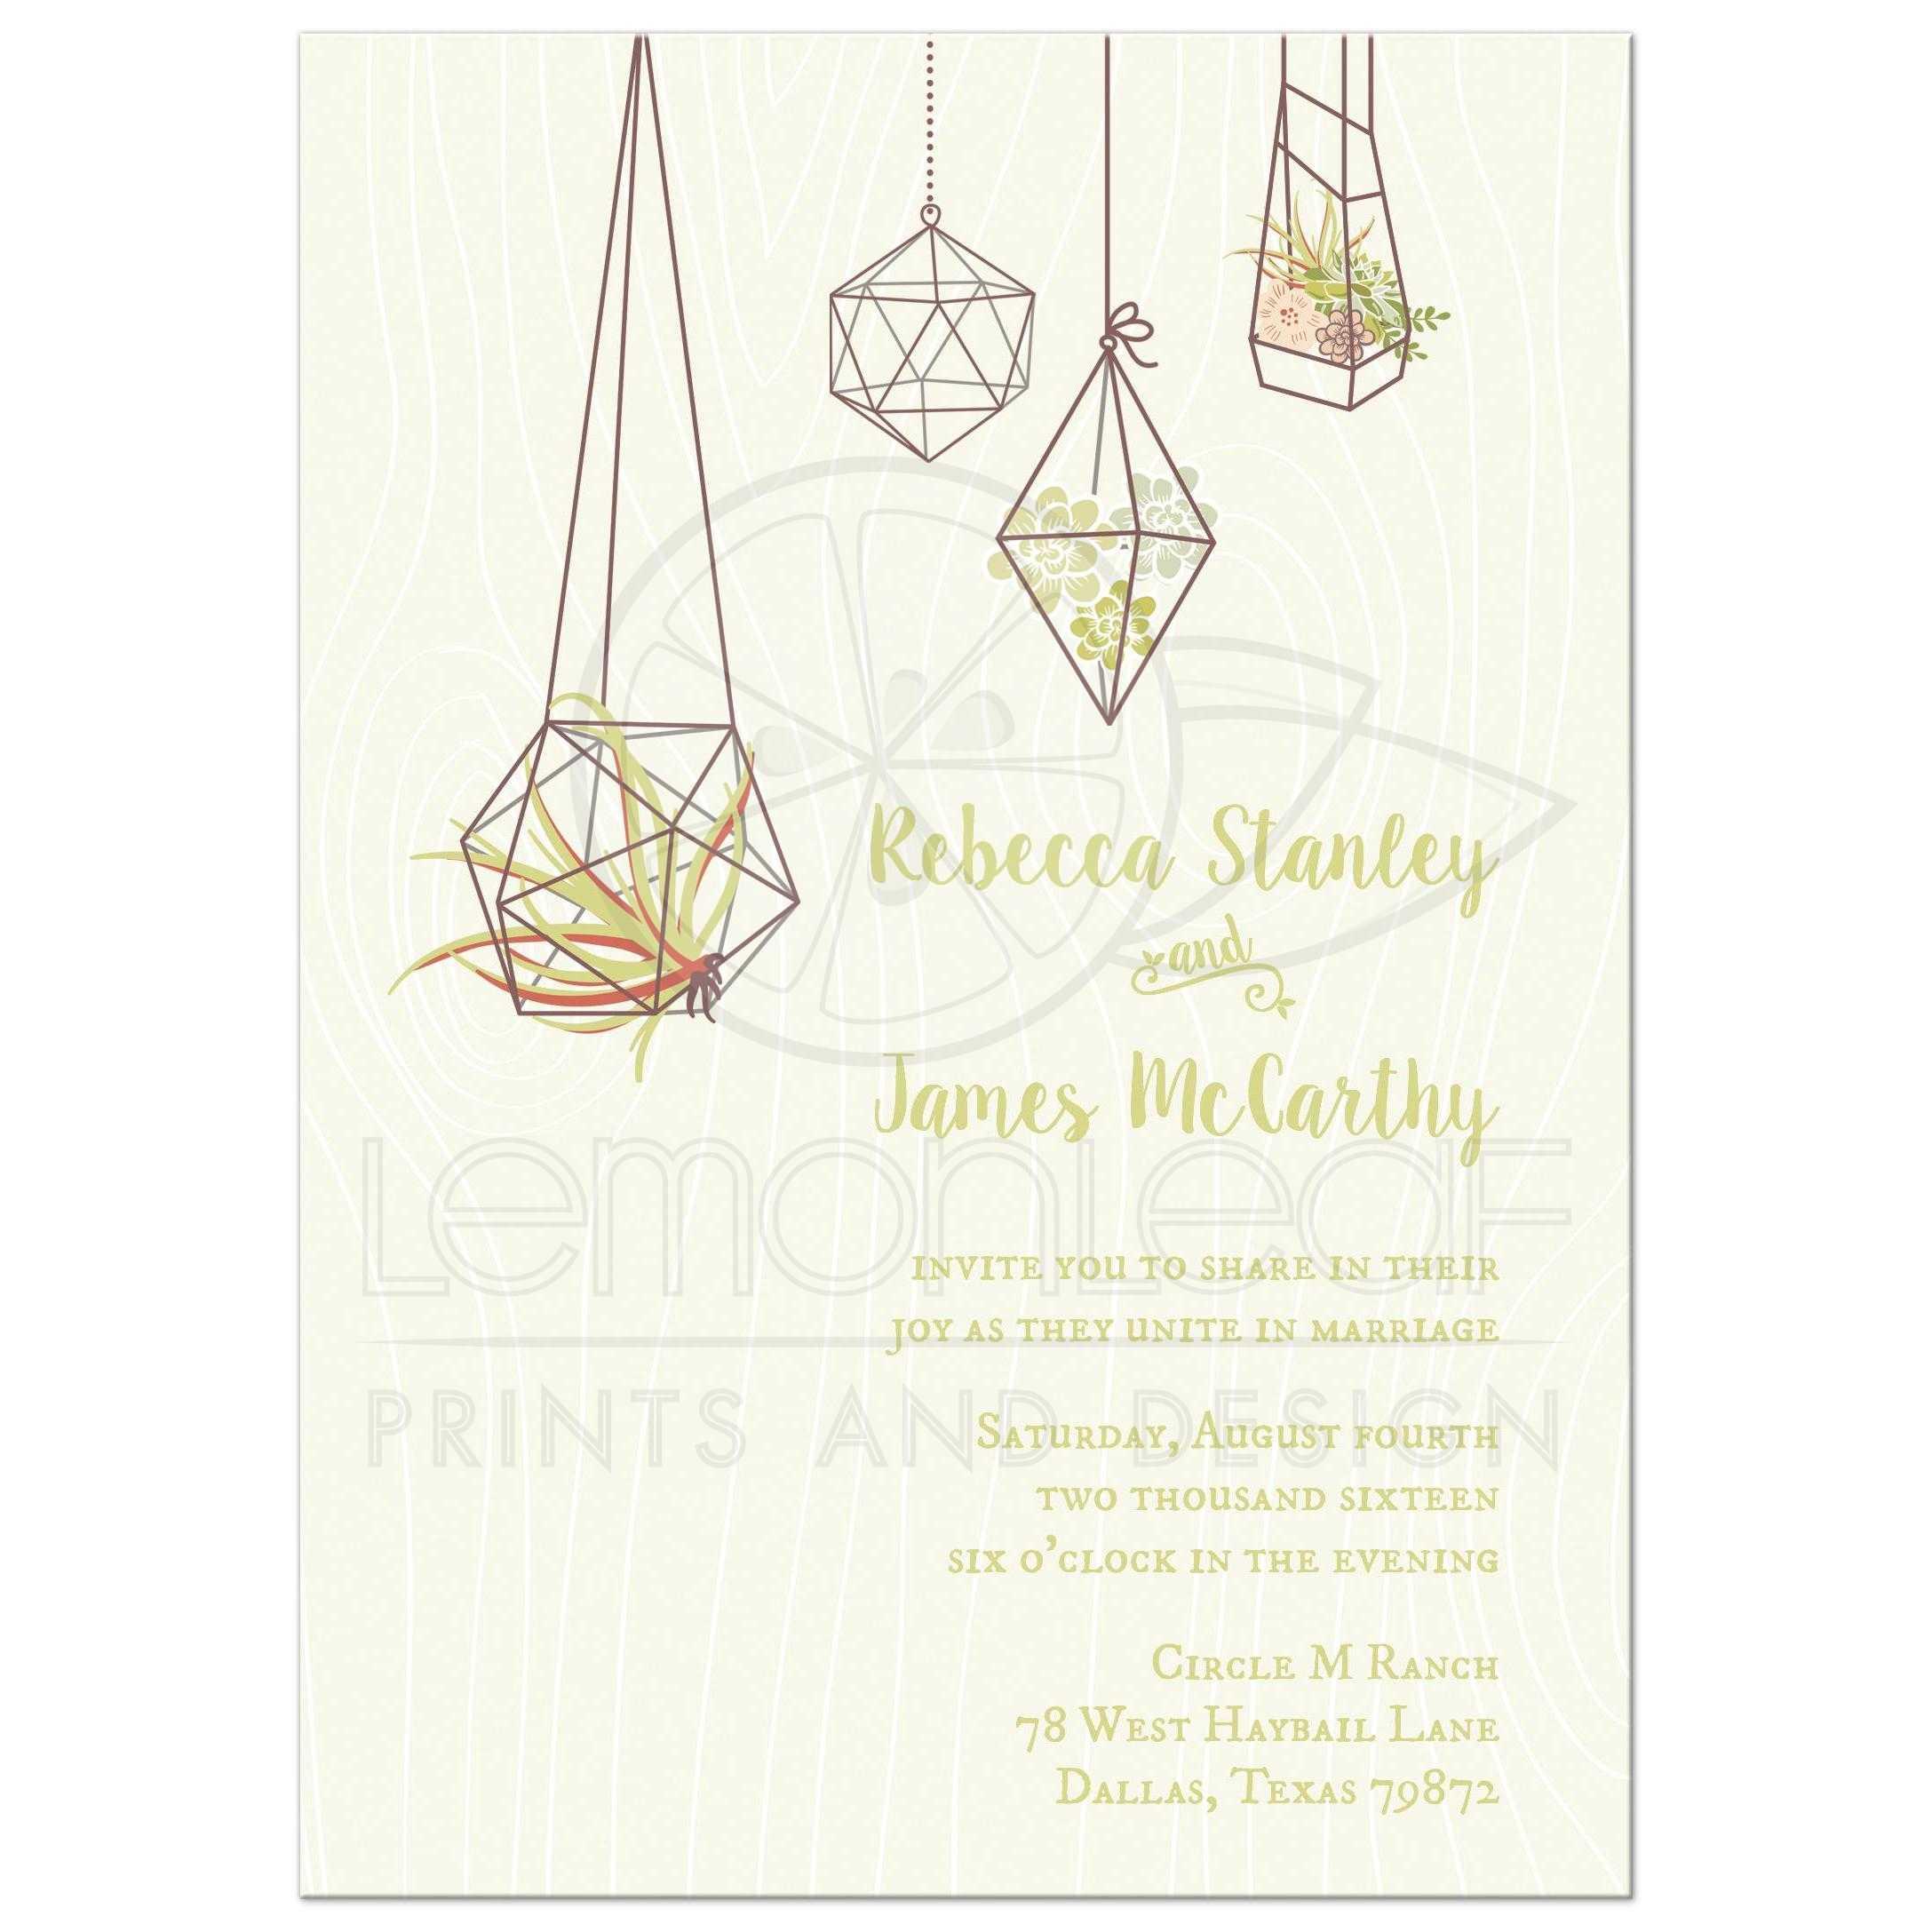 Exceptional Air Plants And Succulent Terrariums Wedding Invitations ...